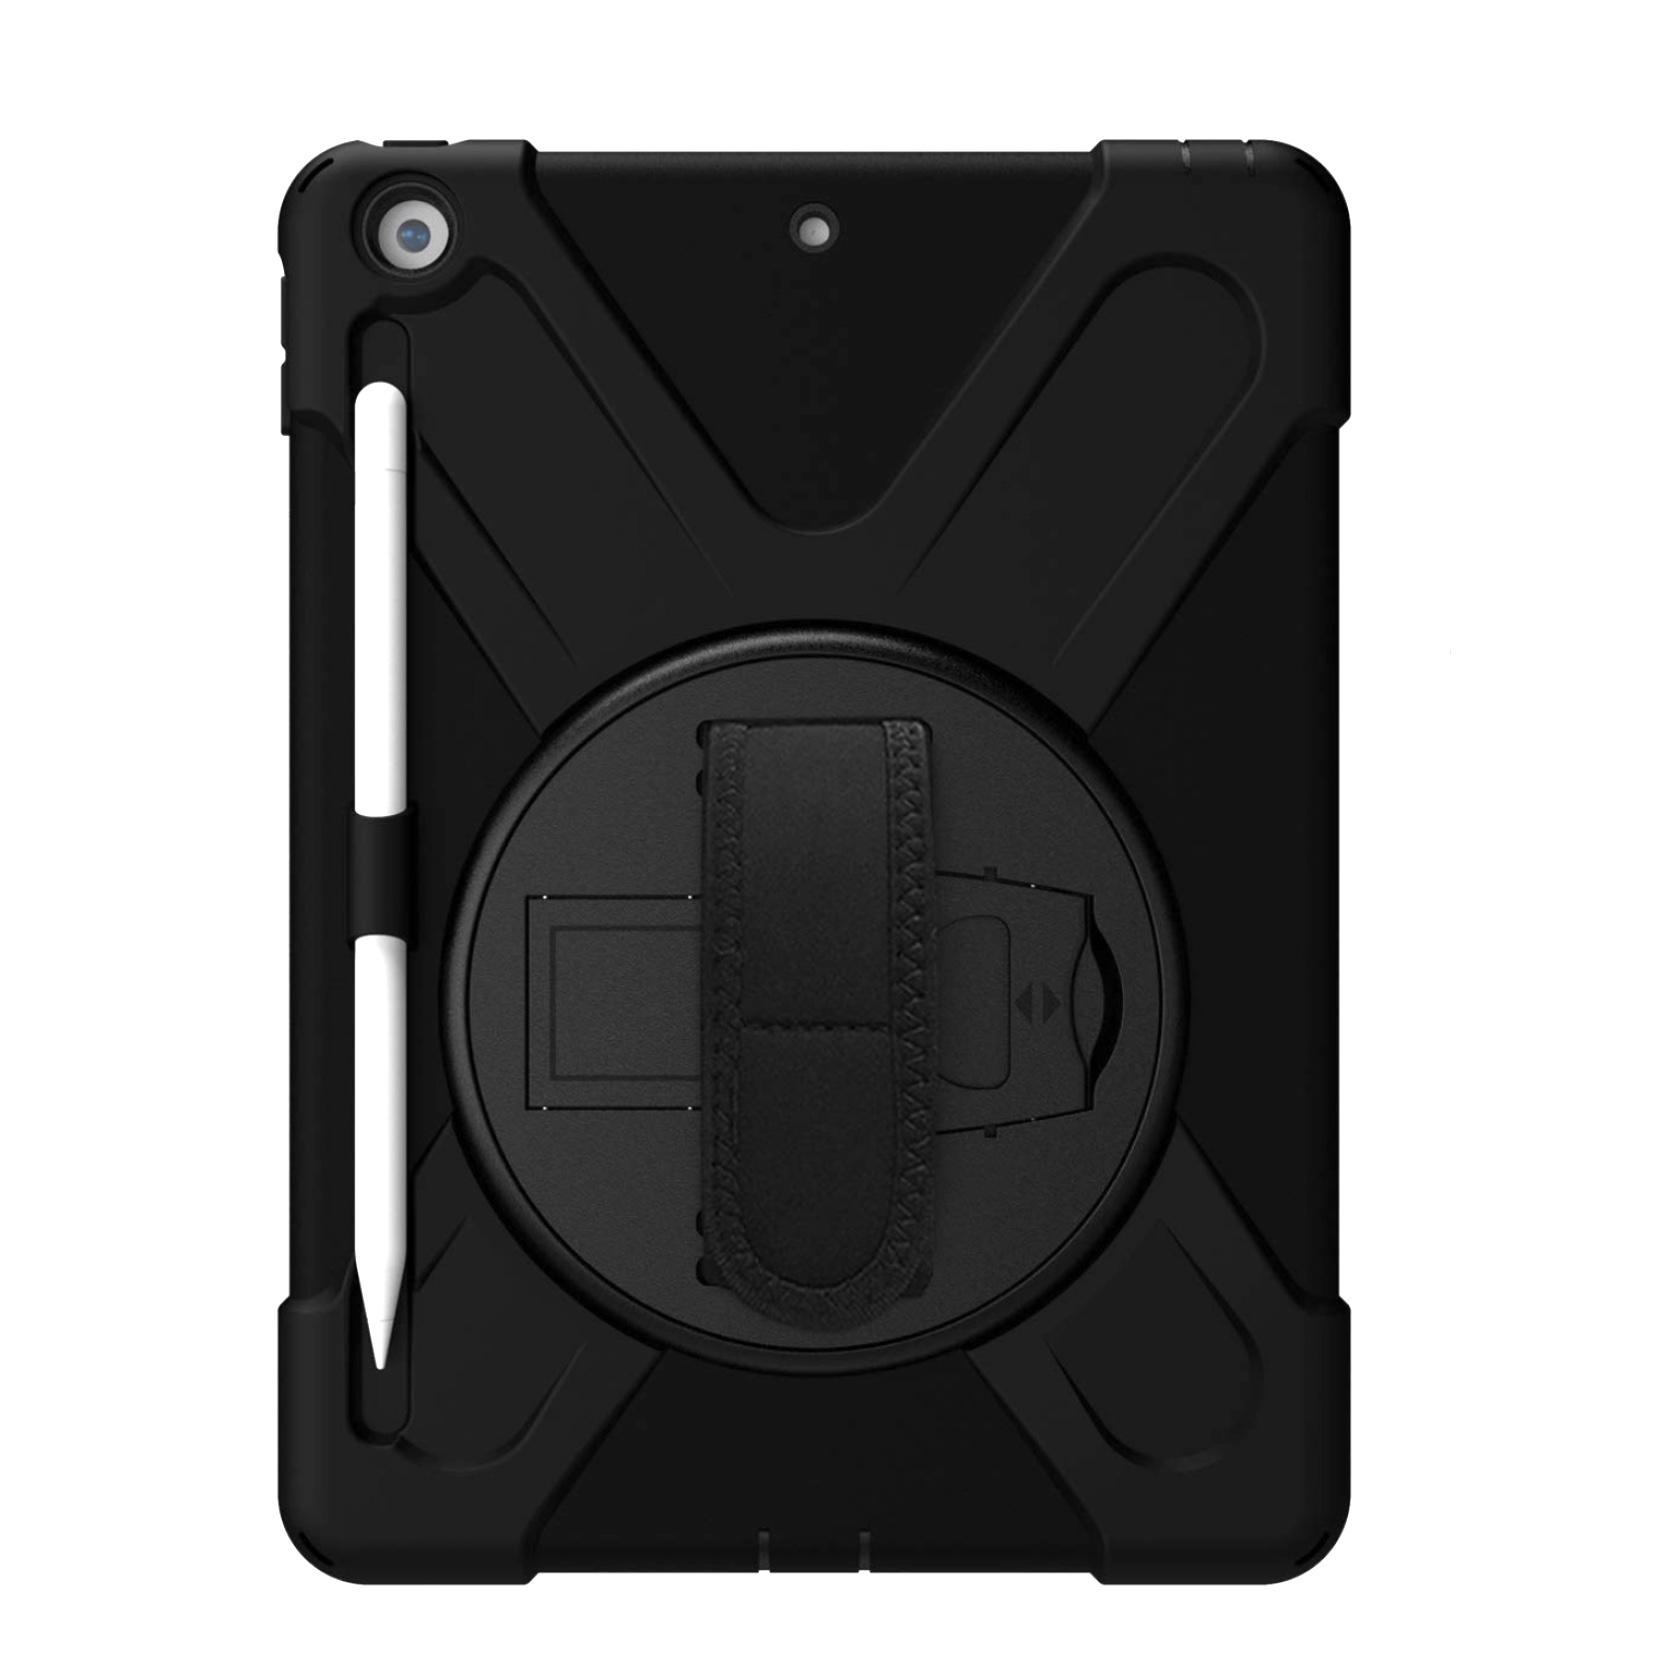 Pack Duo 2 en 1 Galaxy TAB S6 LITE 10.4p Coque renforcee Vancouver et Sangle main rotative